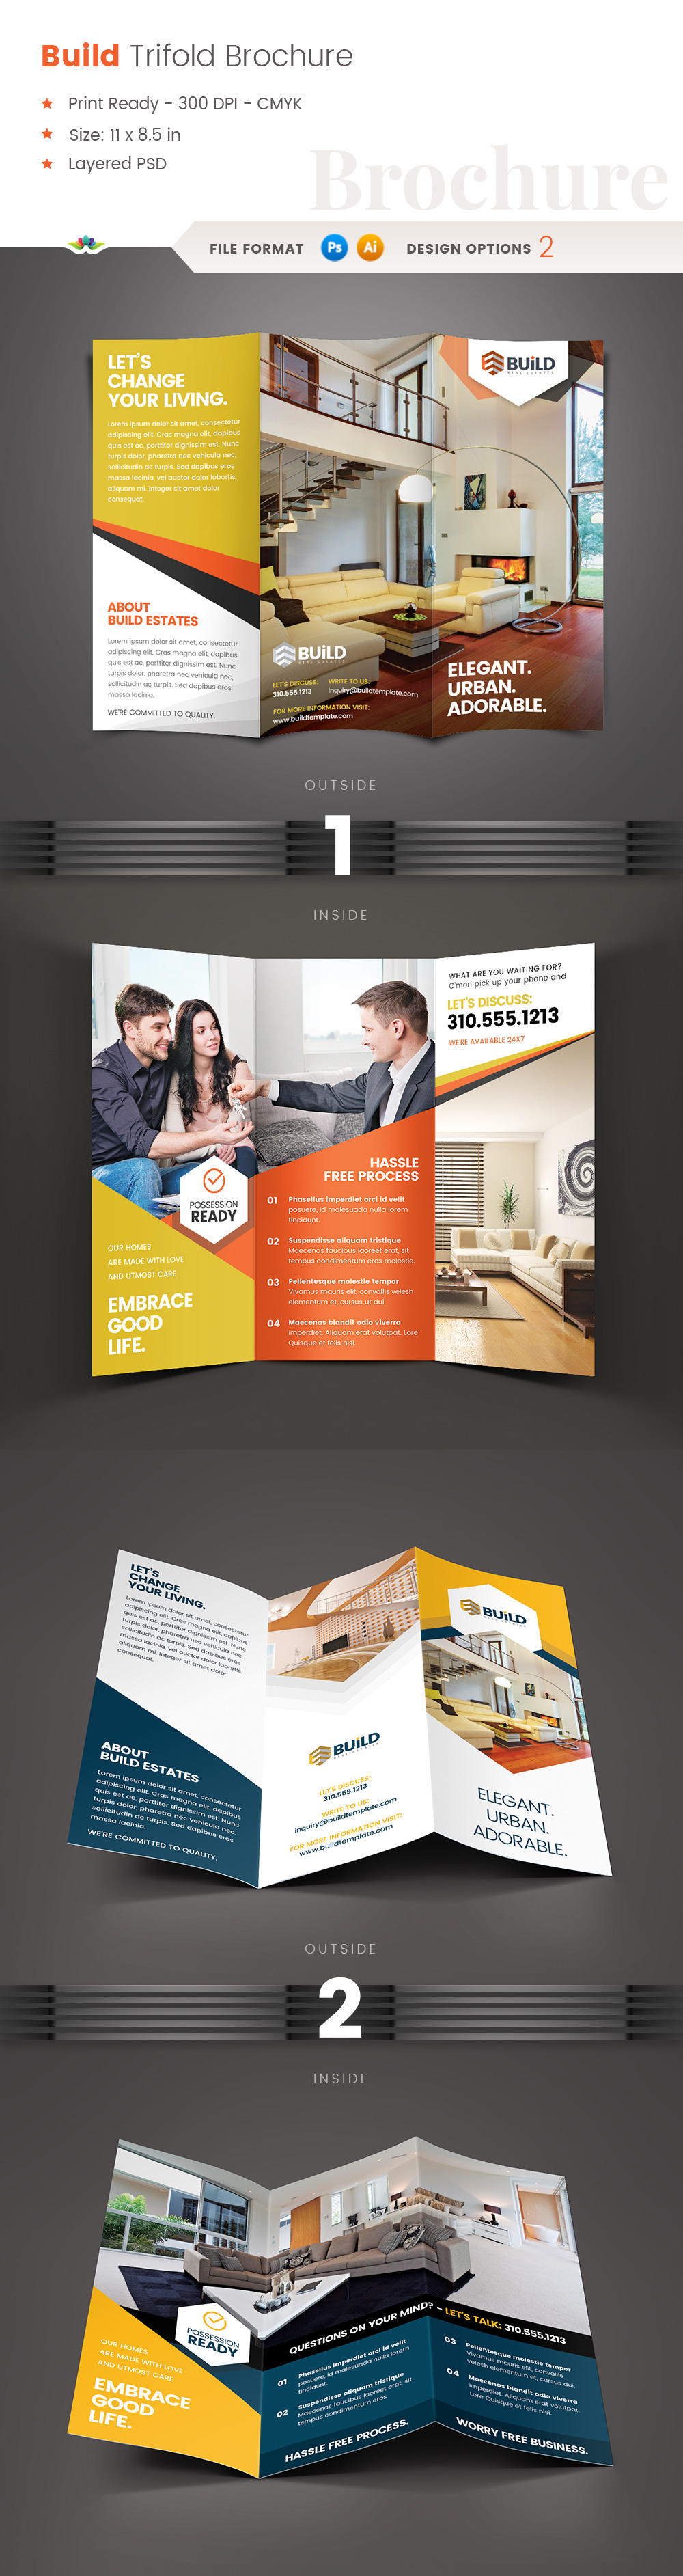 Build Real Estate trifold brochure by Saptarang